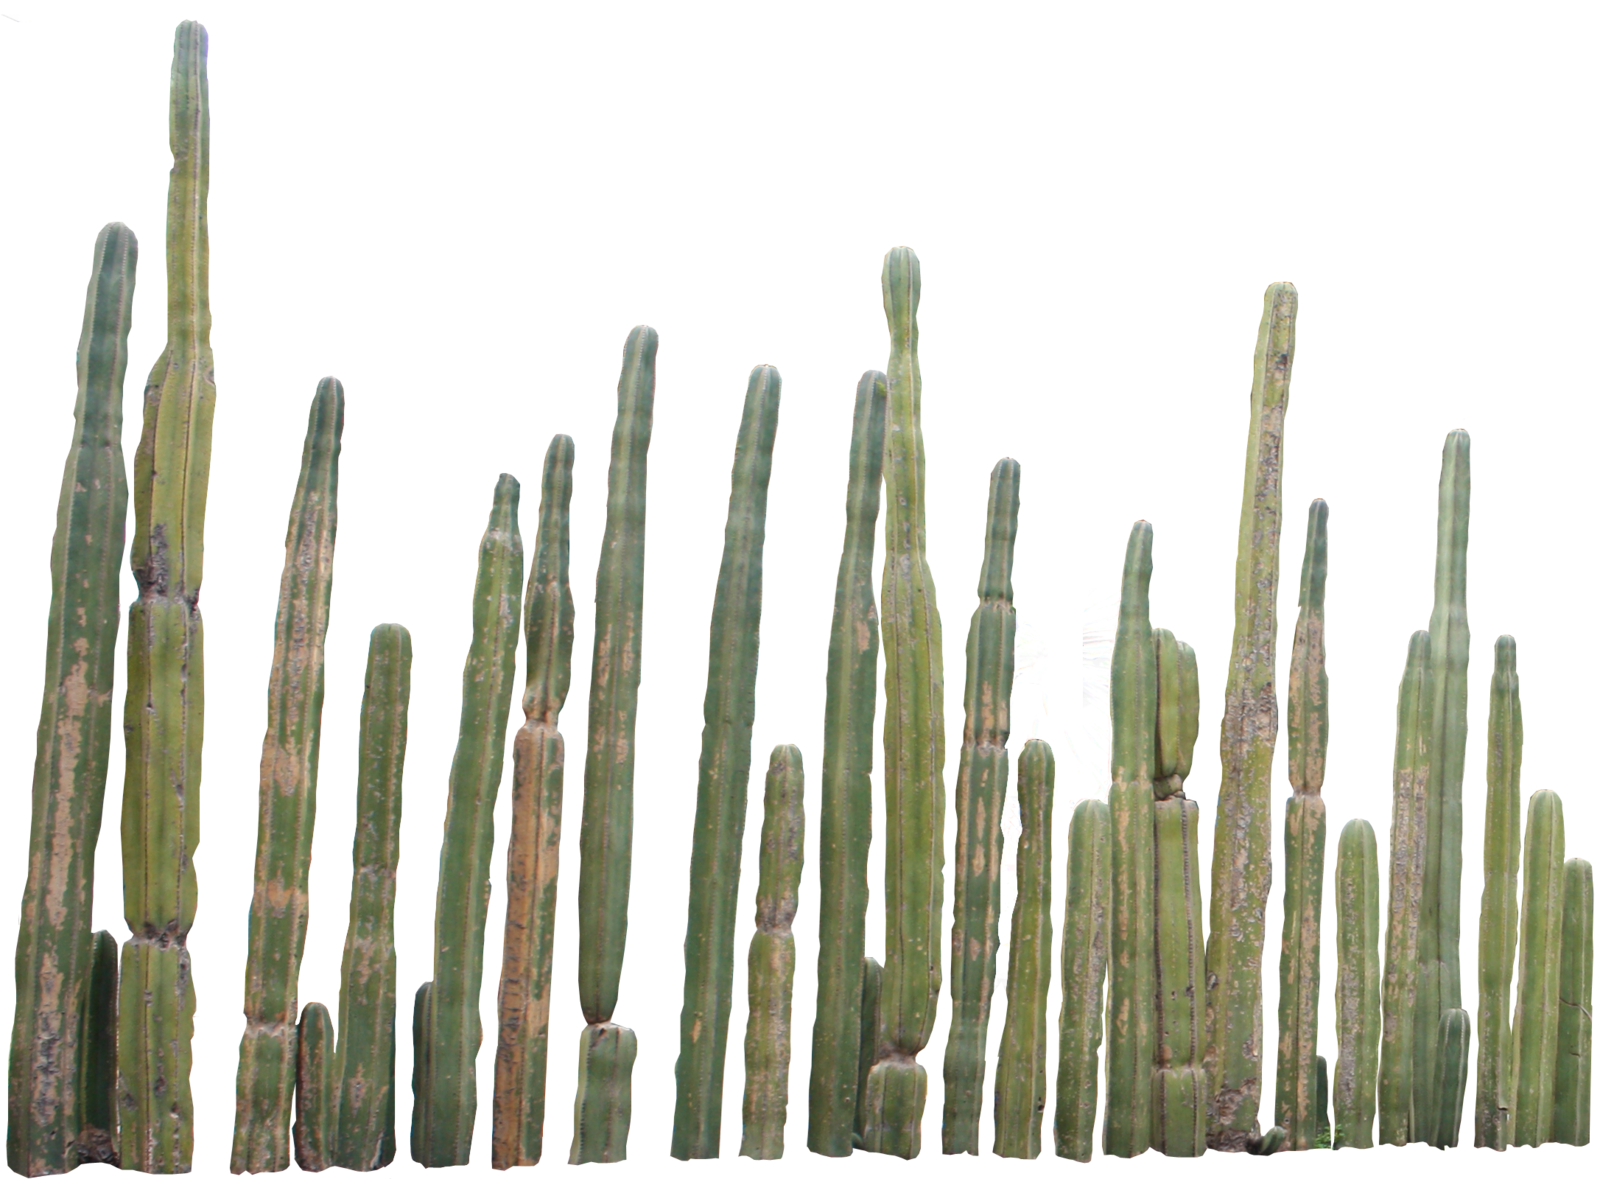 Cactus Png image #24254 - Cactus PNG